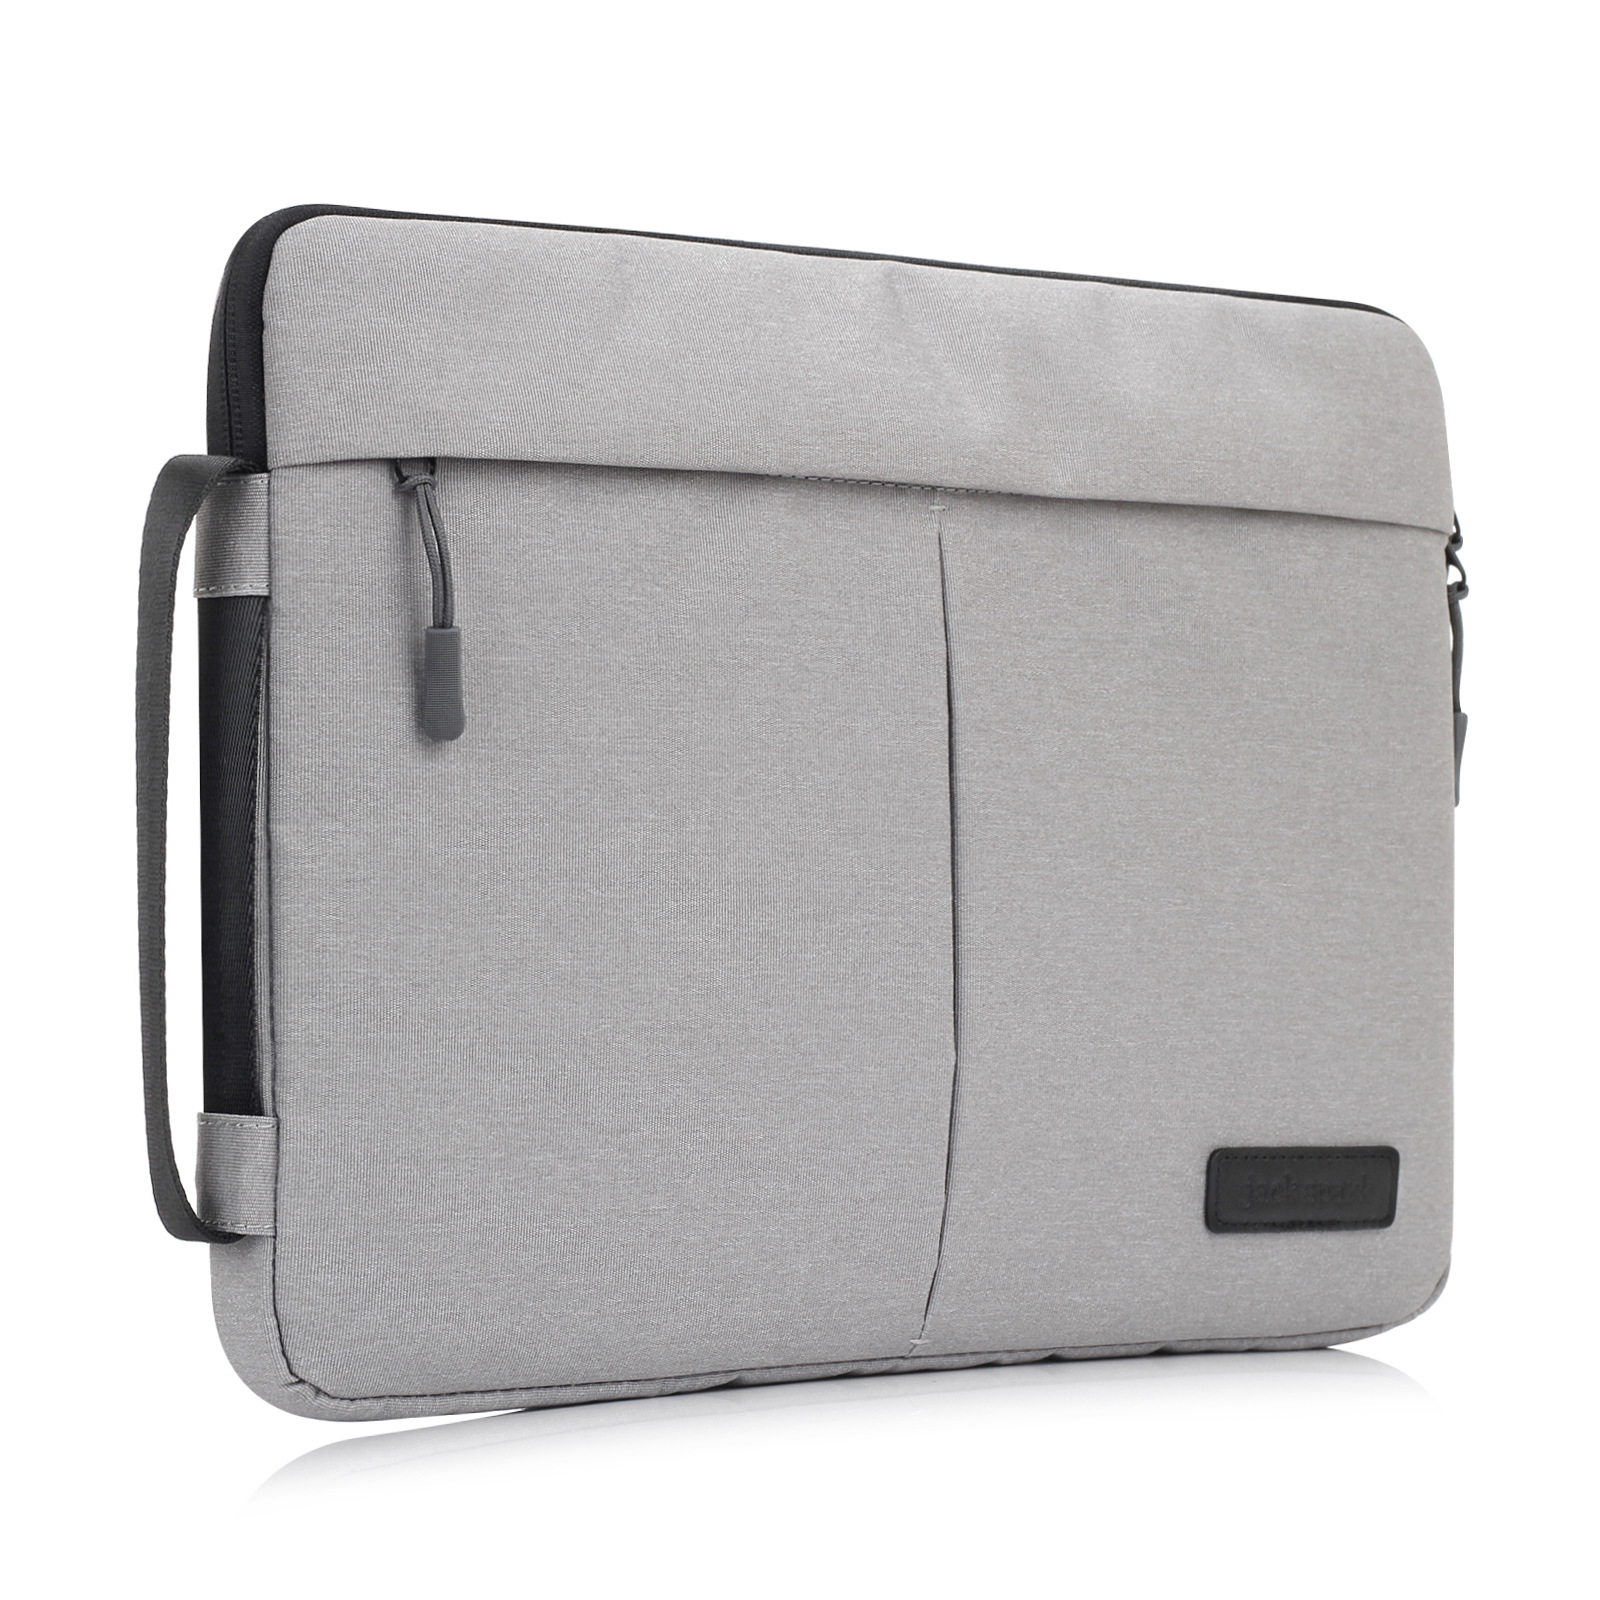 11 12 13 14 15.4 Notebook Laptop Sleeve Bag Pouch Case For Acer Dell HP Surface Asus Lenovo Macbook Pro Reitina Air Xiaomi MAC